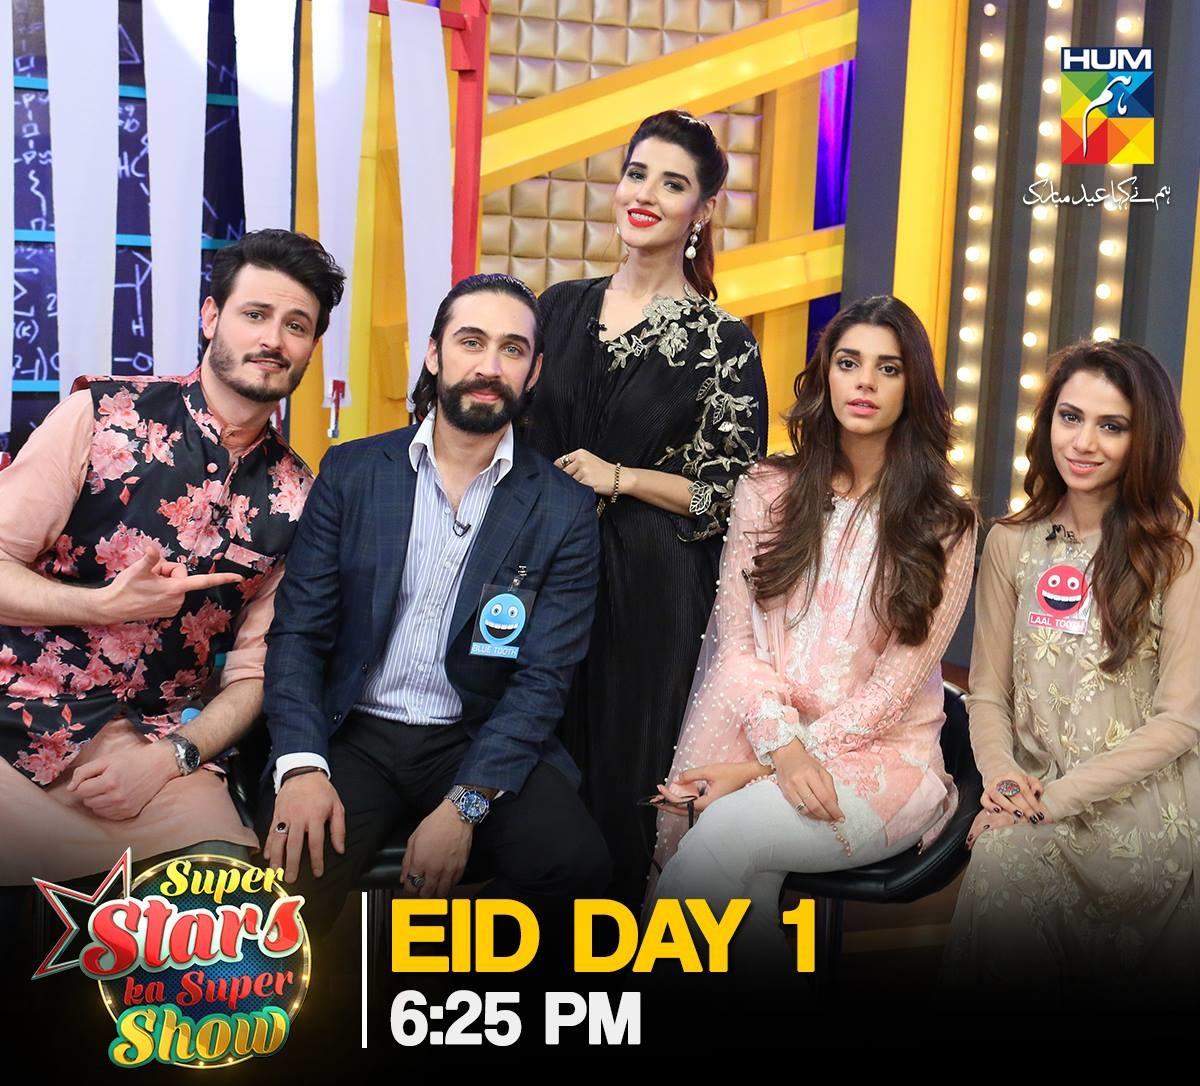 HUM TV Super Stars ka Super Show Eid Day 1